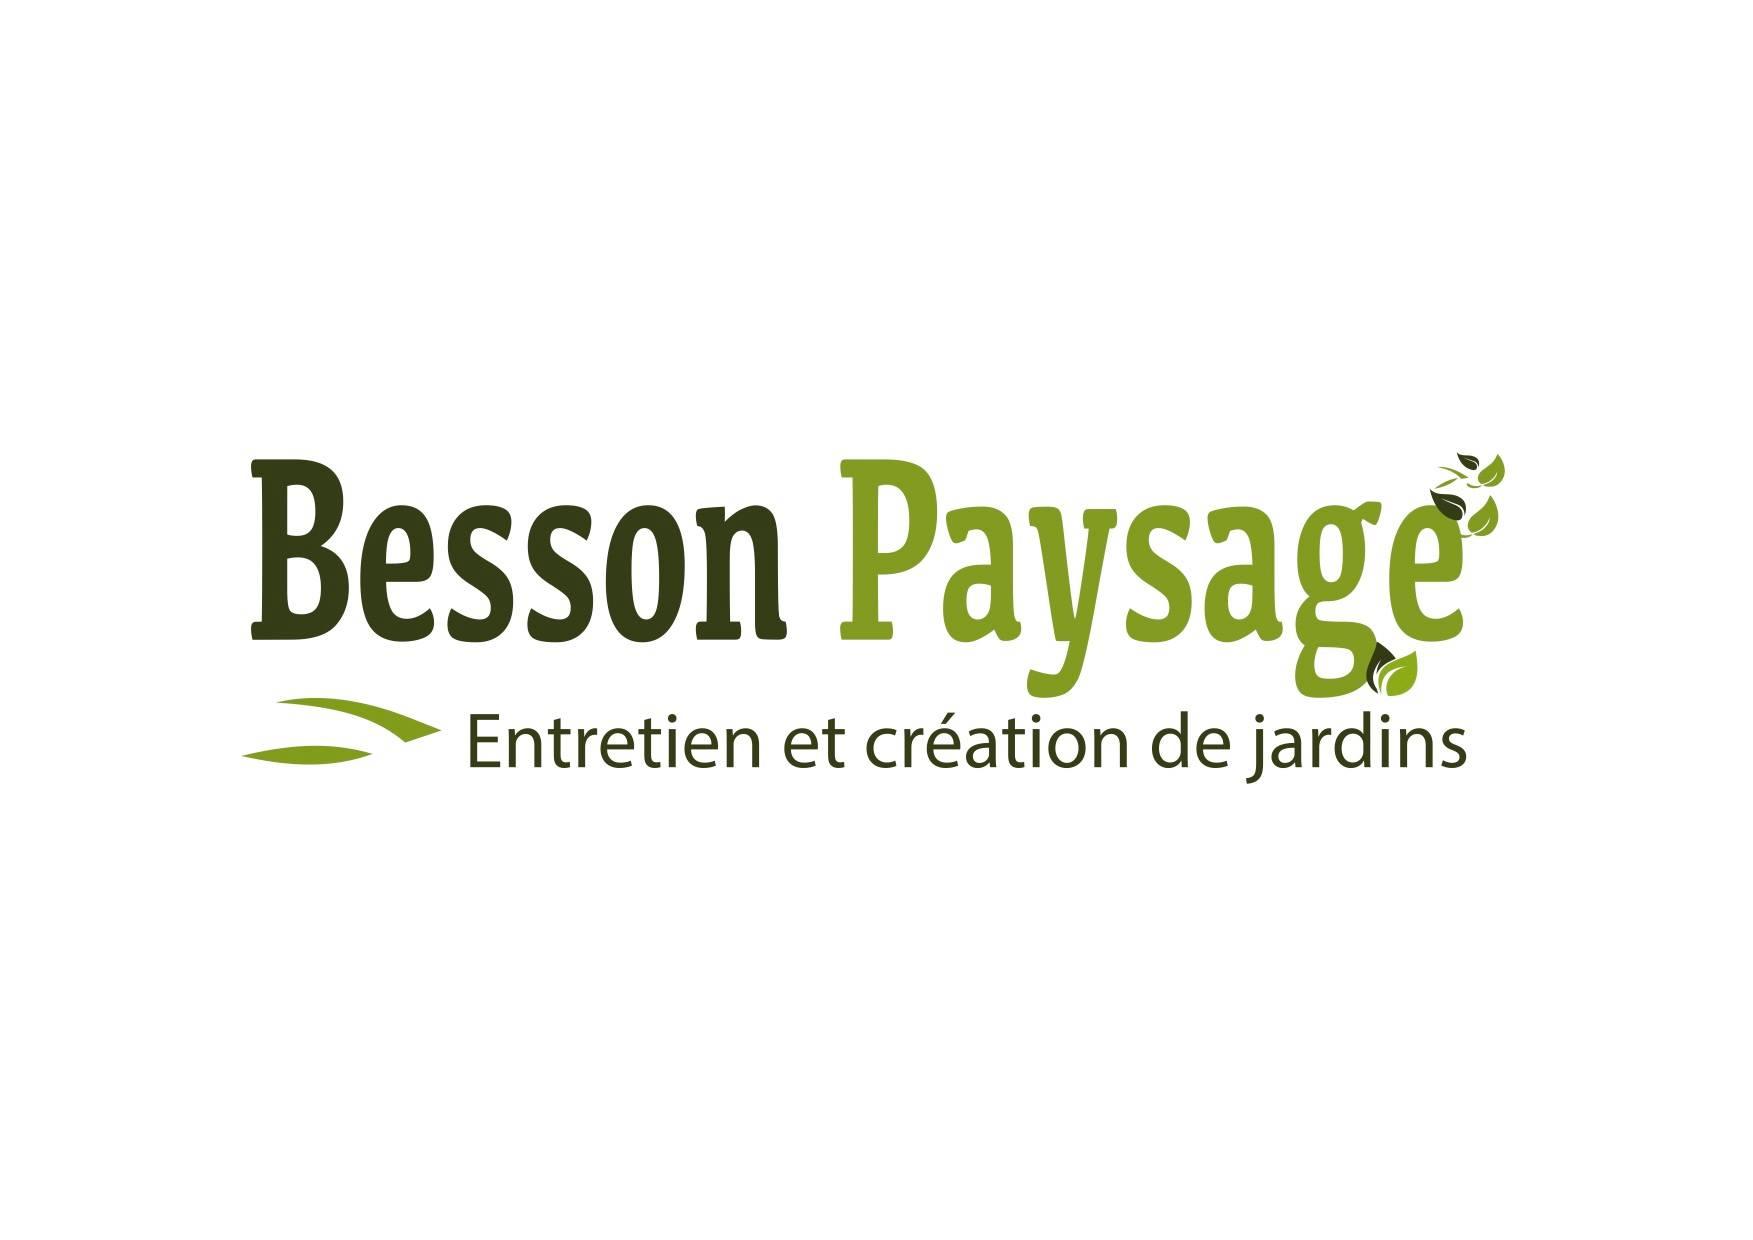 Besson Paysage